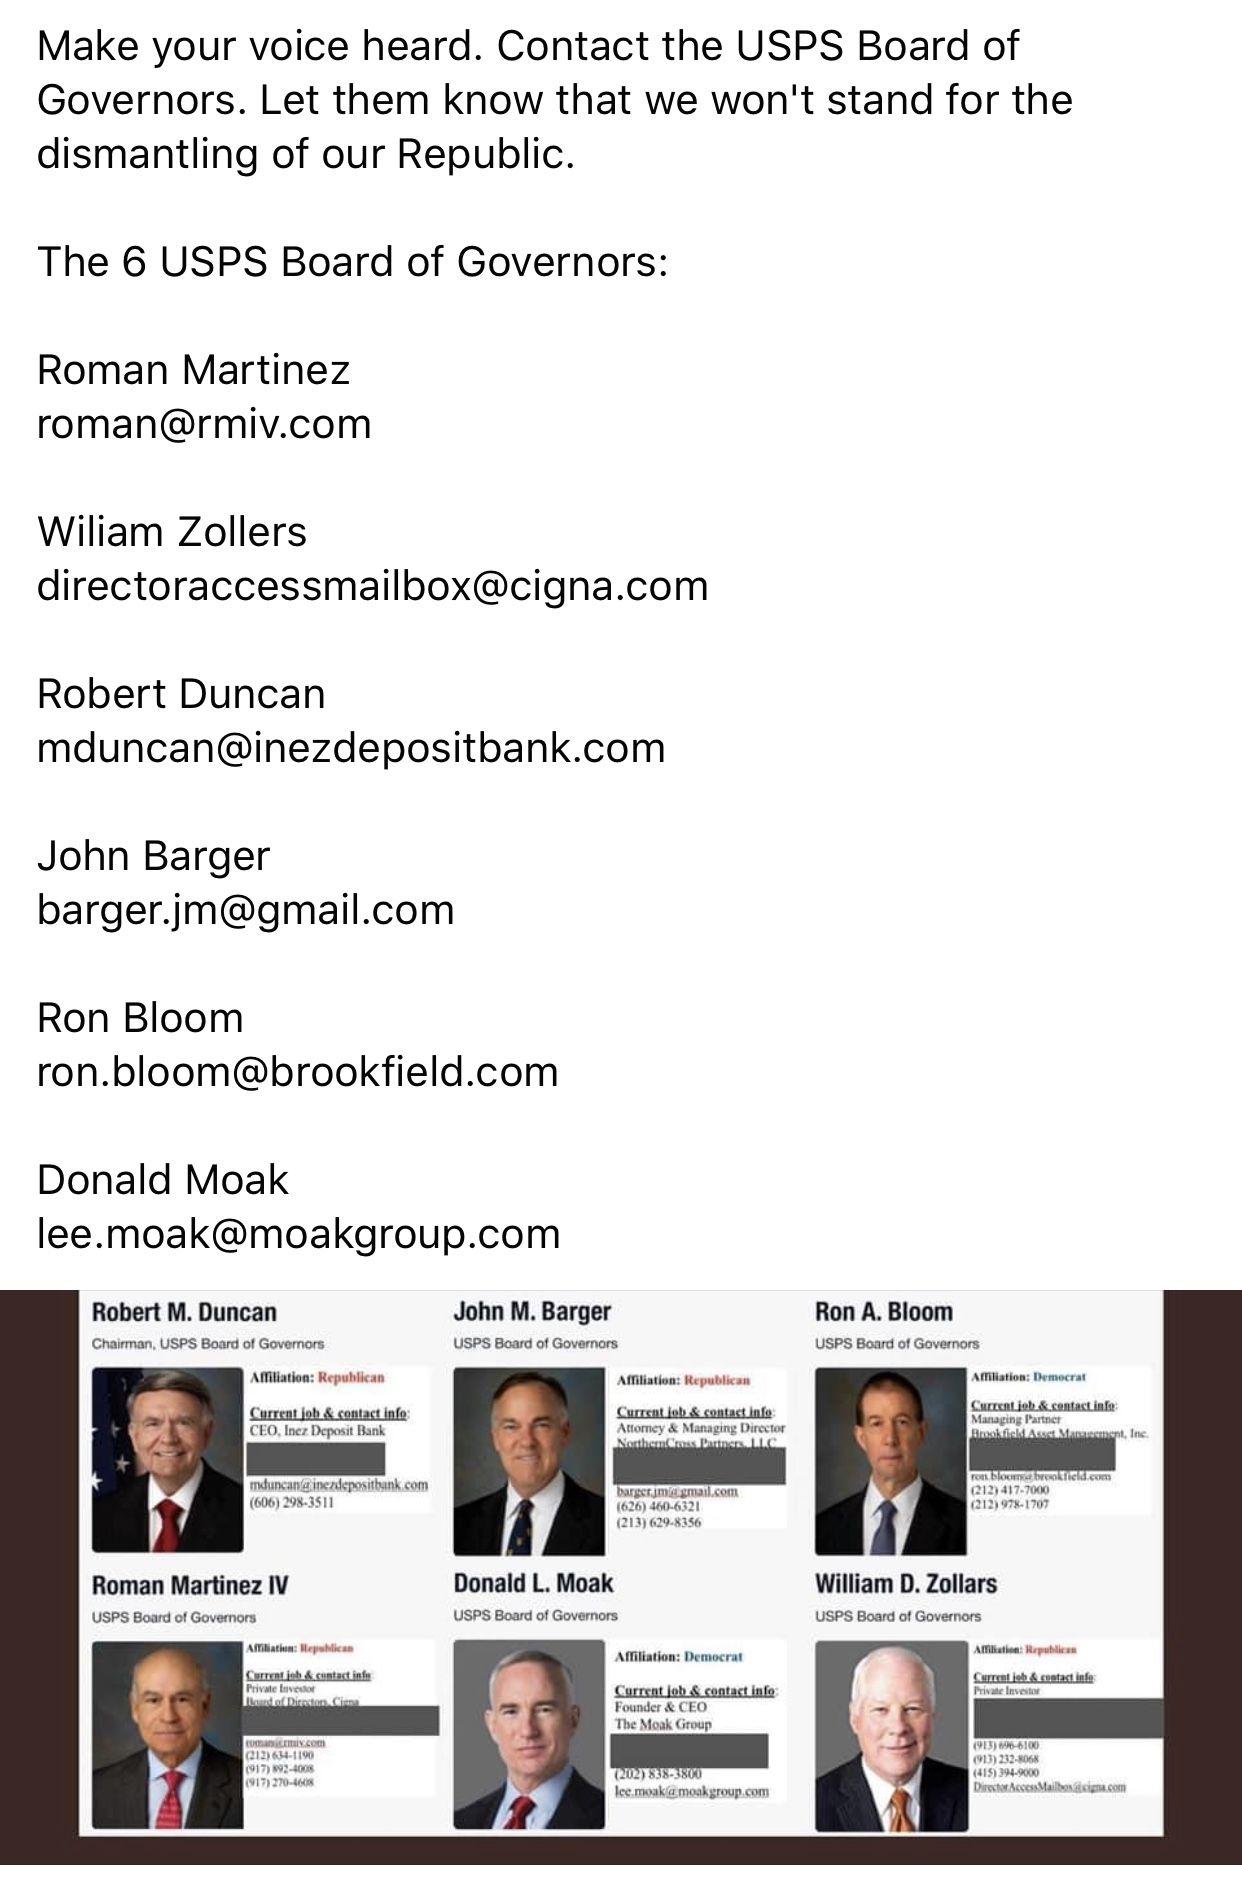 Pin By Jan On U S Mail In 2020 Fascist Martinez Robert Duncan